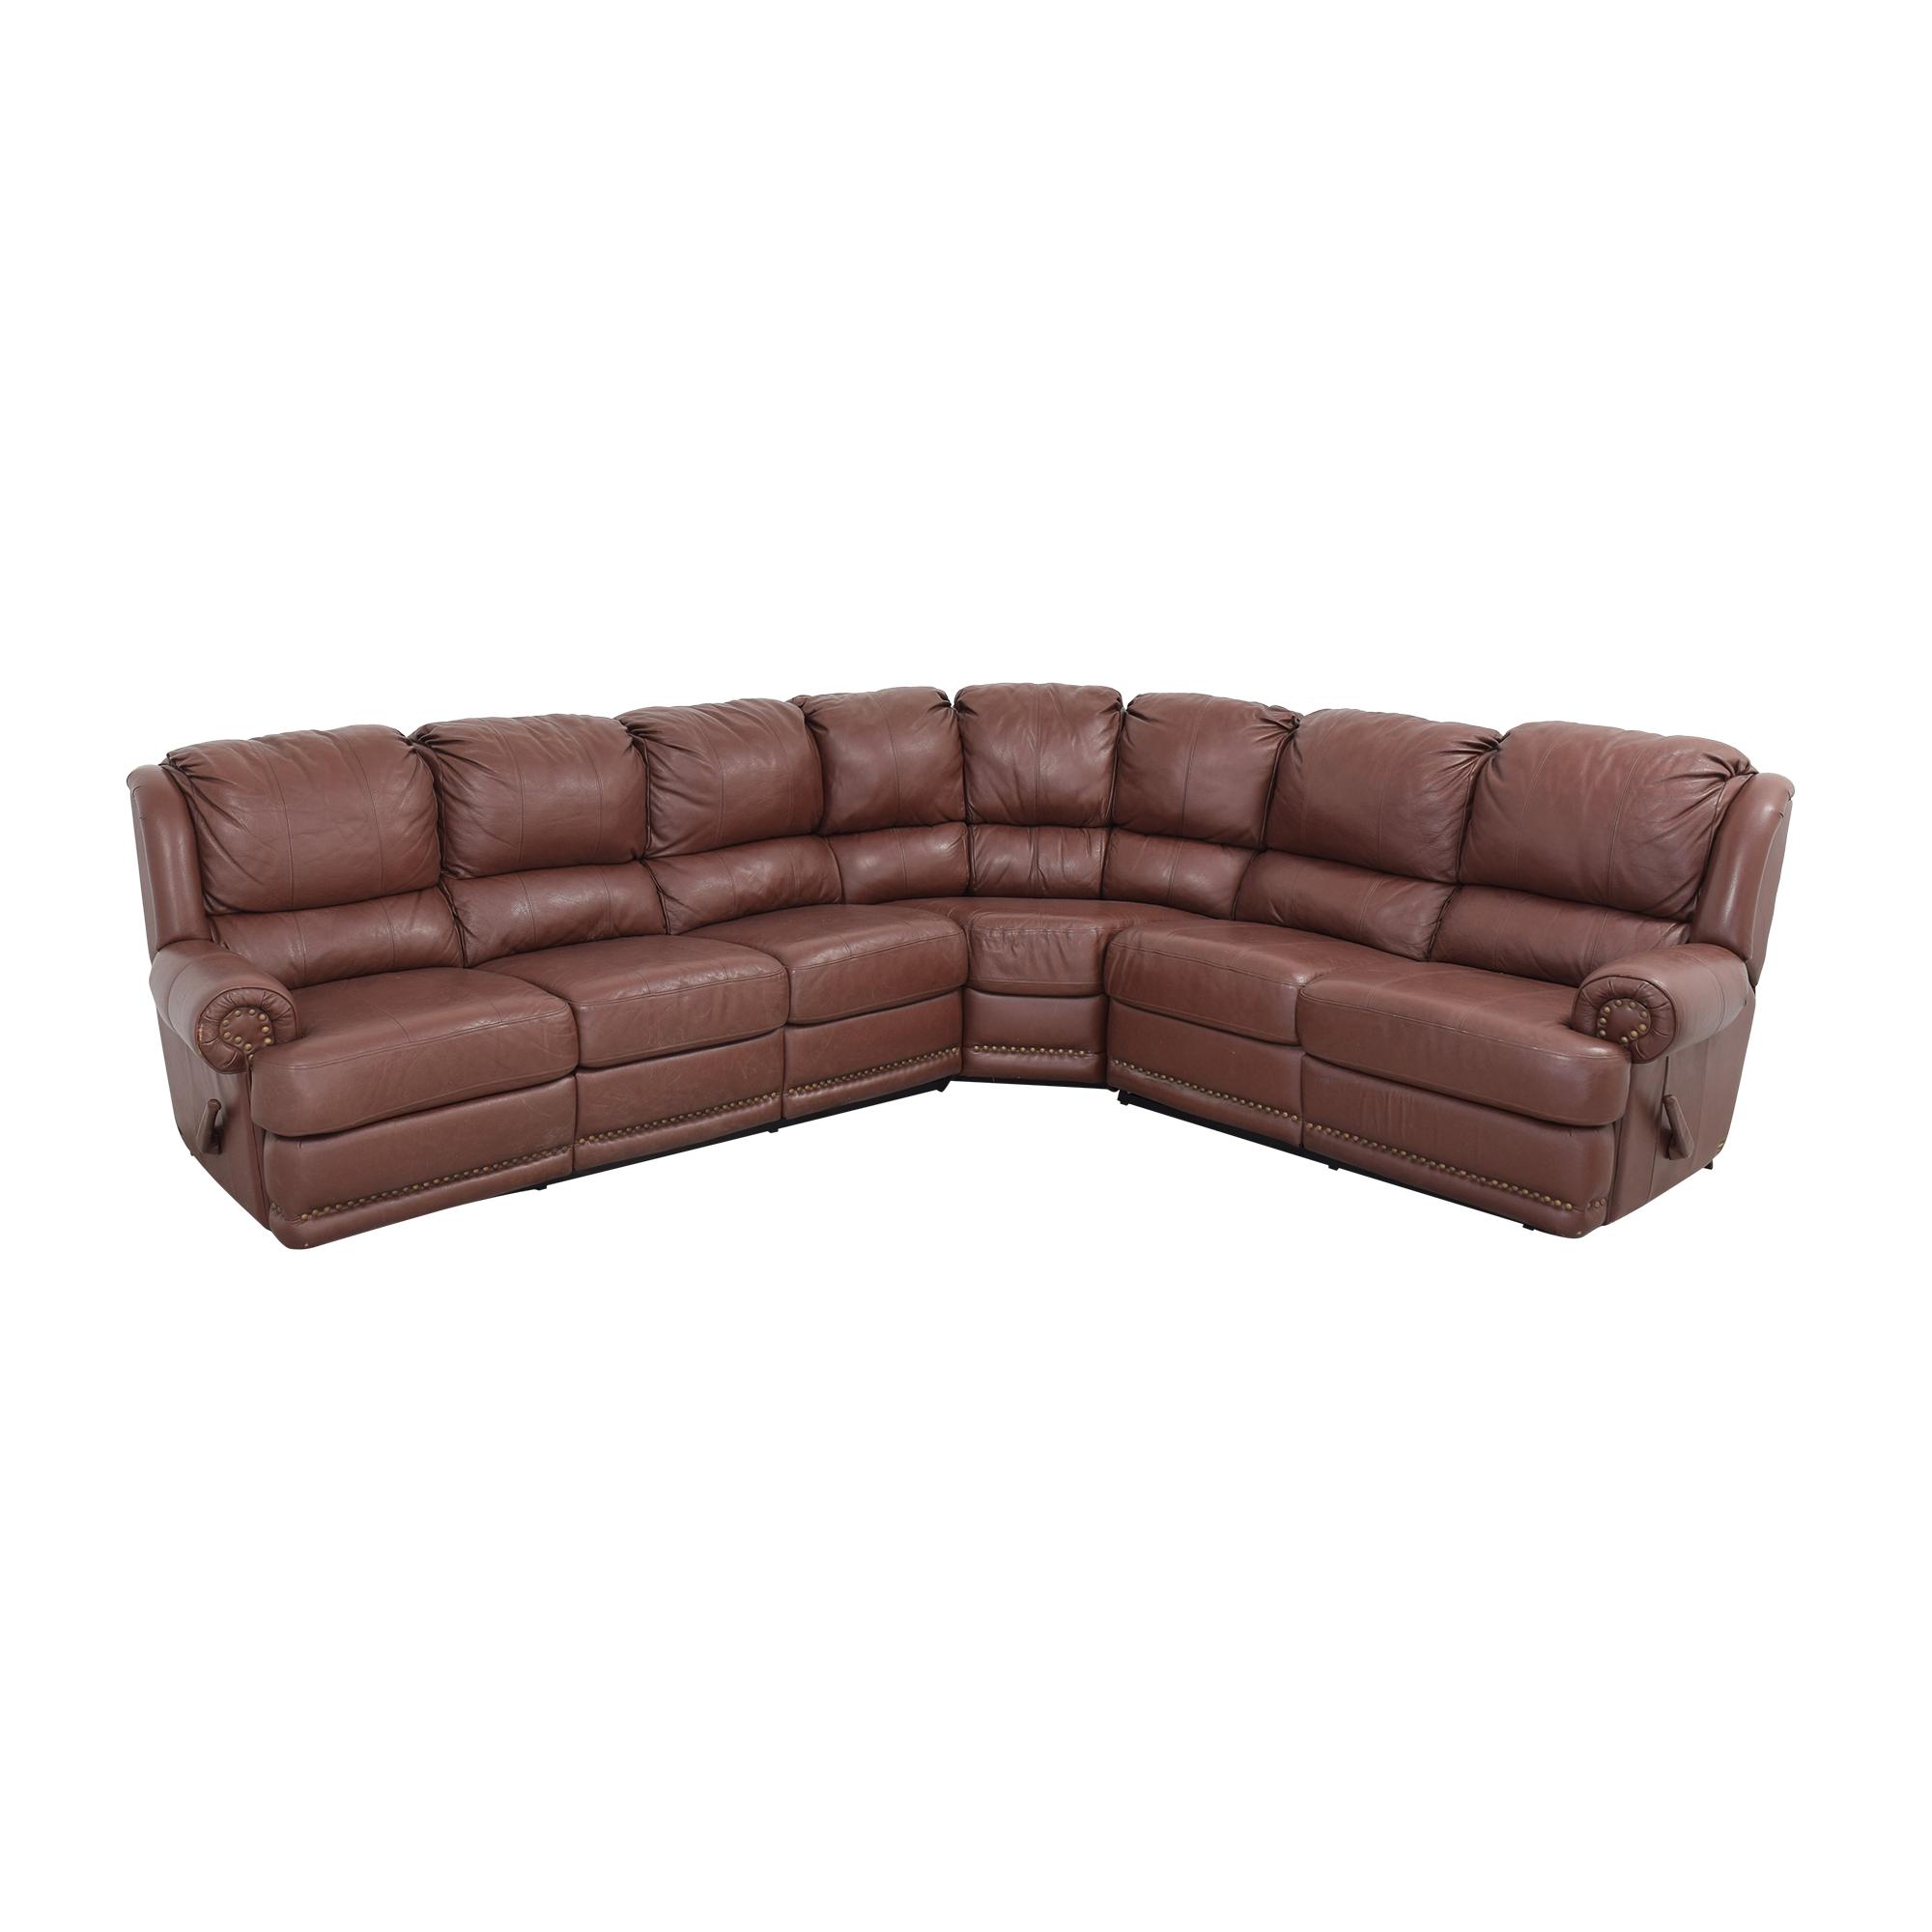 Elran Elran Sectional Sofa with Recliner discount